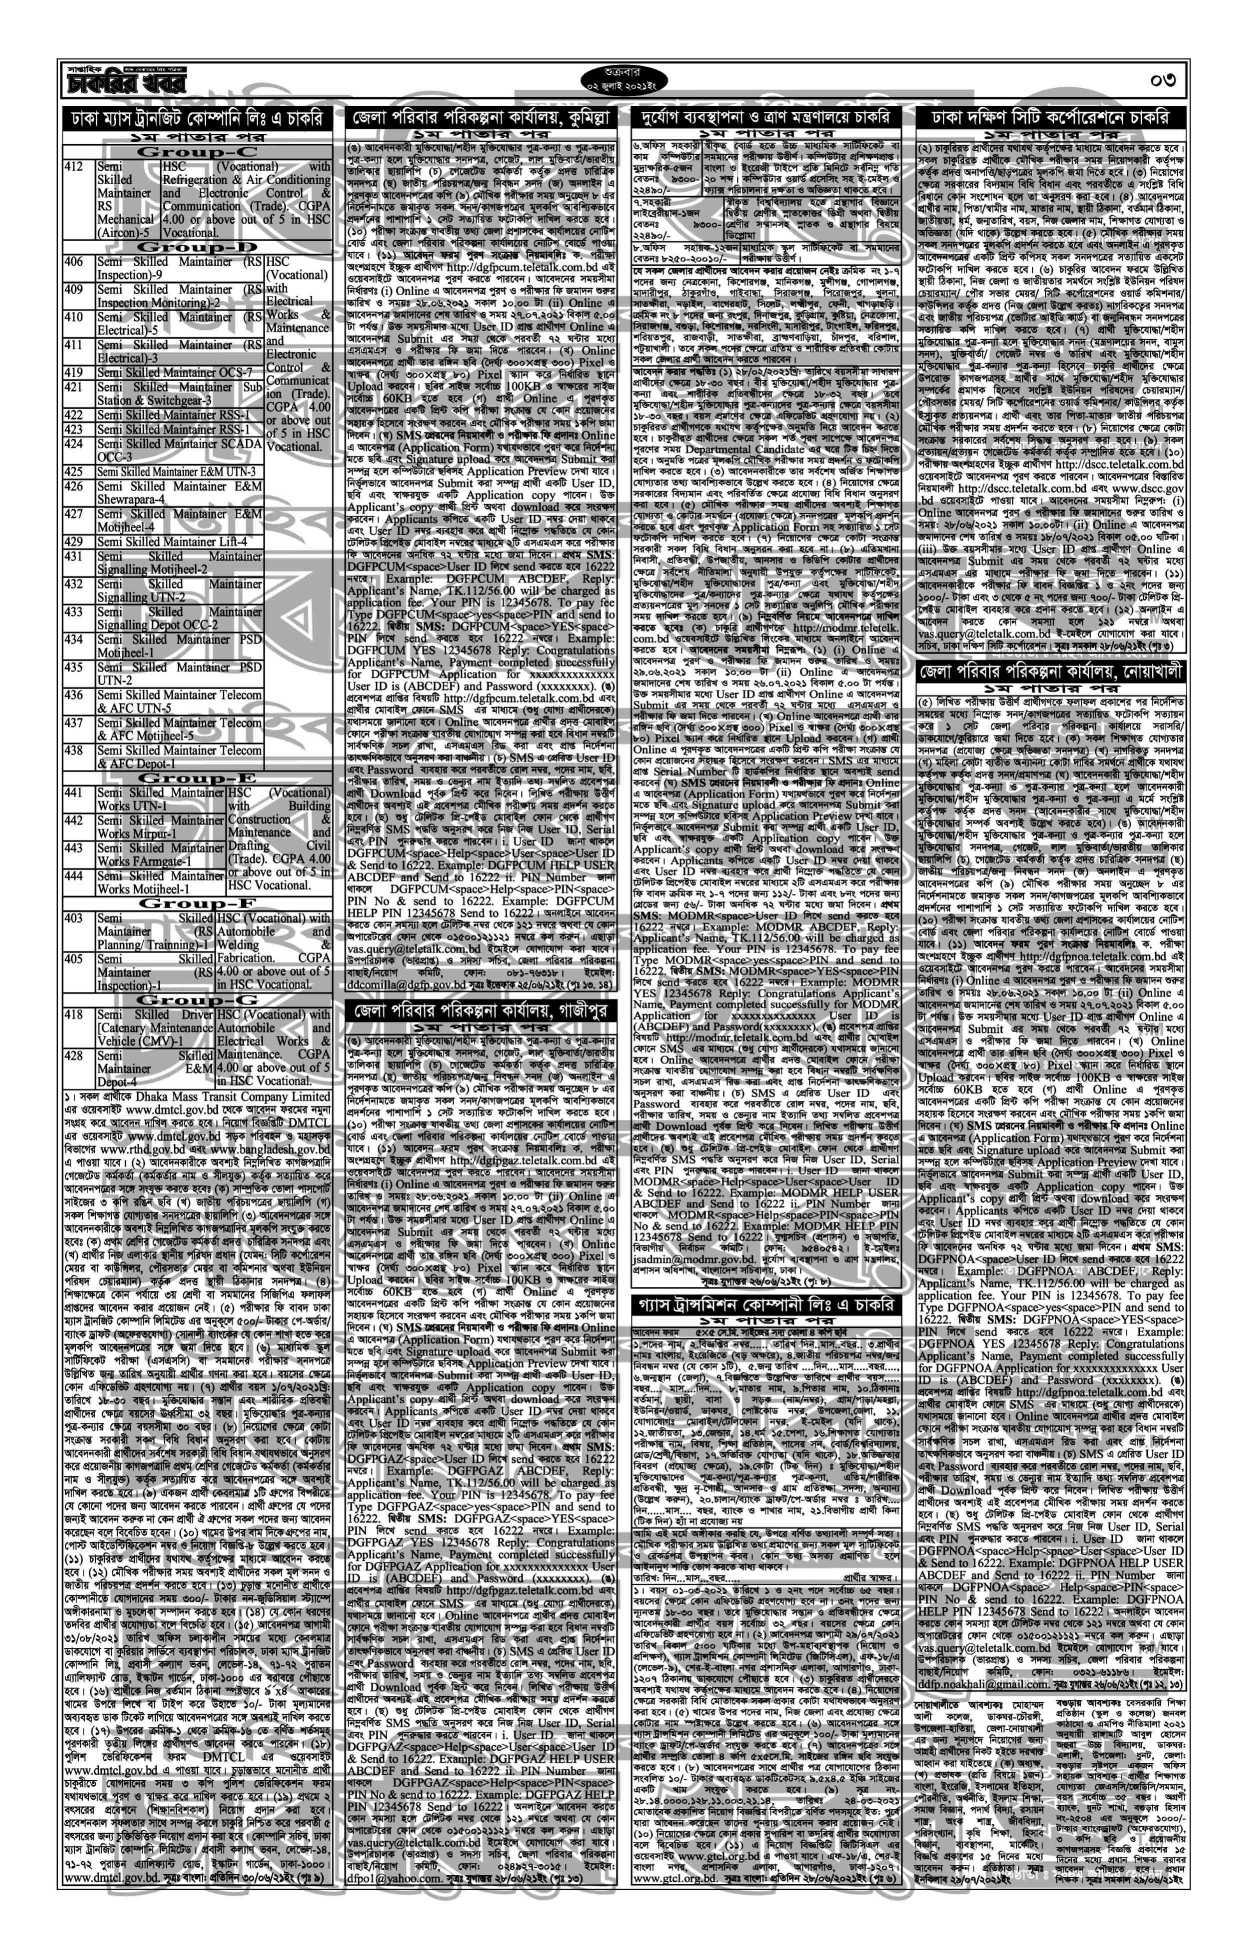 02 July 2021 Saptahik chakrir khobor potrika - সাপ্তাহিক চাকরির খবর পত্রিকা ০২ জুলাই ২০২১ - weekly job newspaper 02 July 2021 - সাপ্তাহিক চাকরির খবর পত্রিকা ২০২১